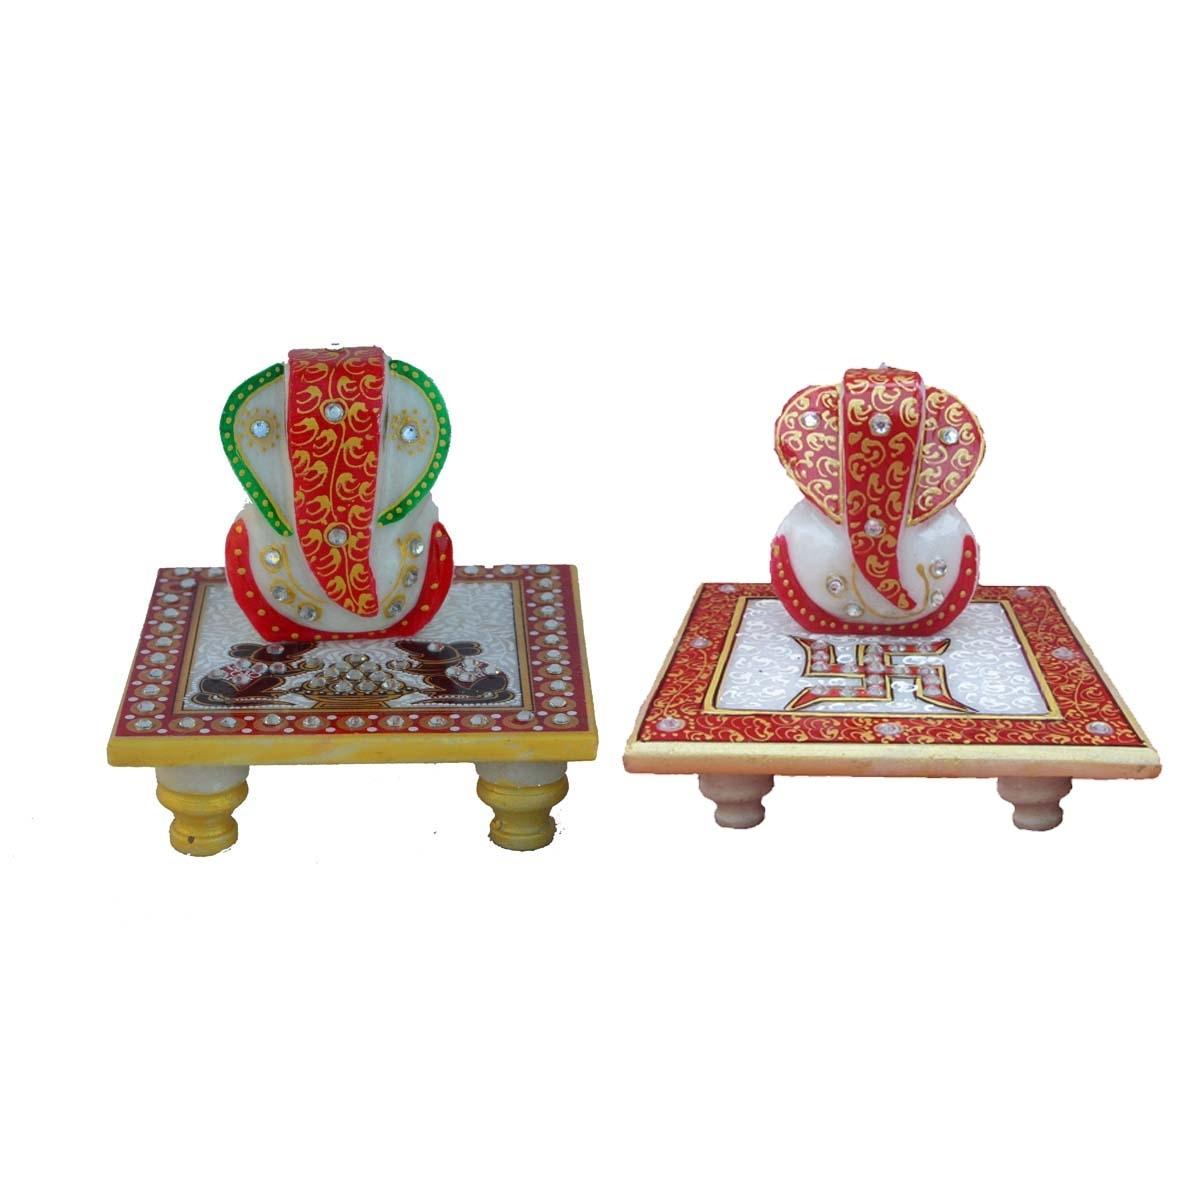 Set of 2 Lord Ganesha Marble Chowkis Indian Home Decor